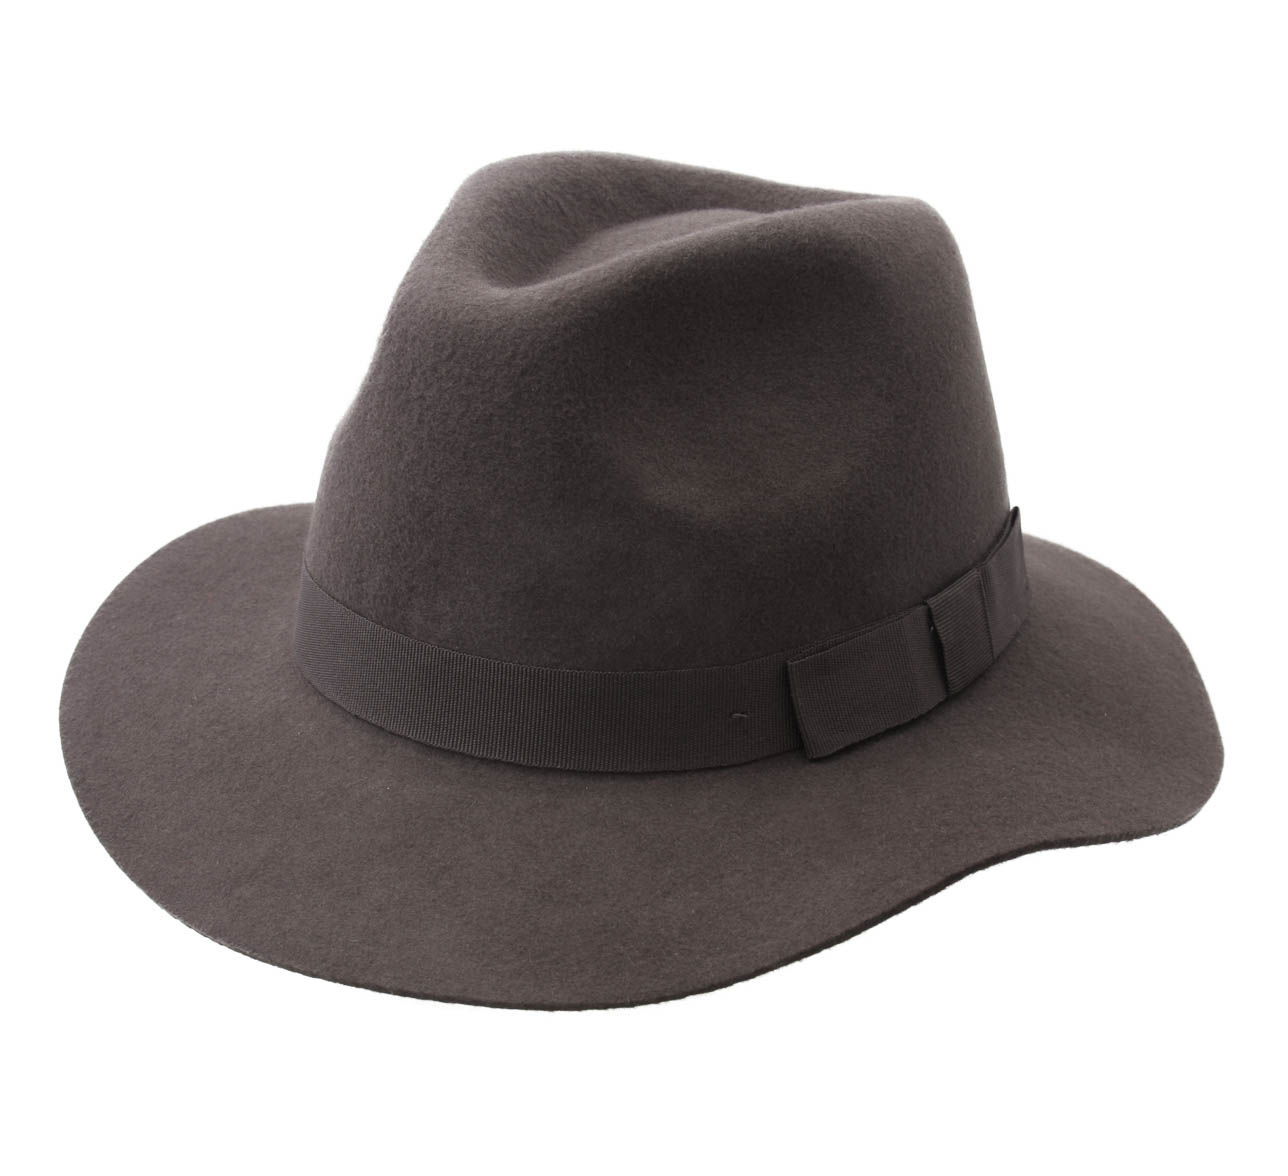 97a287abe811a Indiana - Hats Brixton